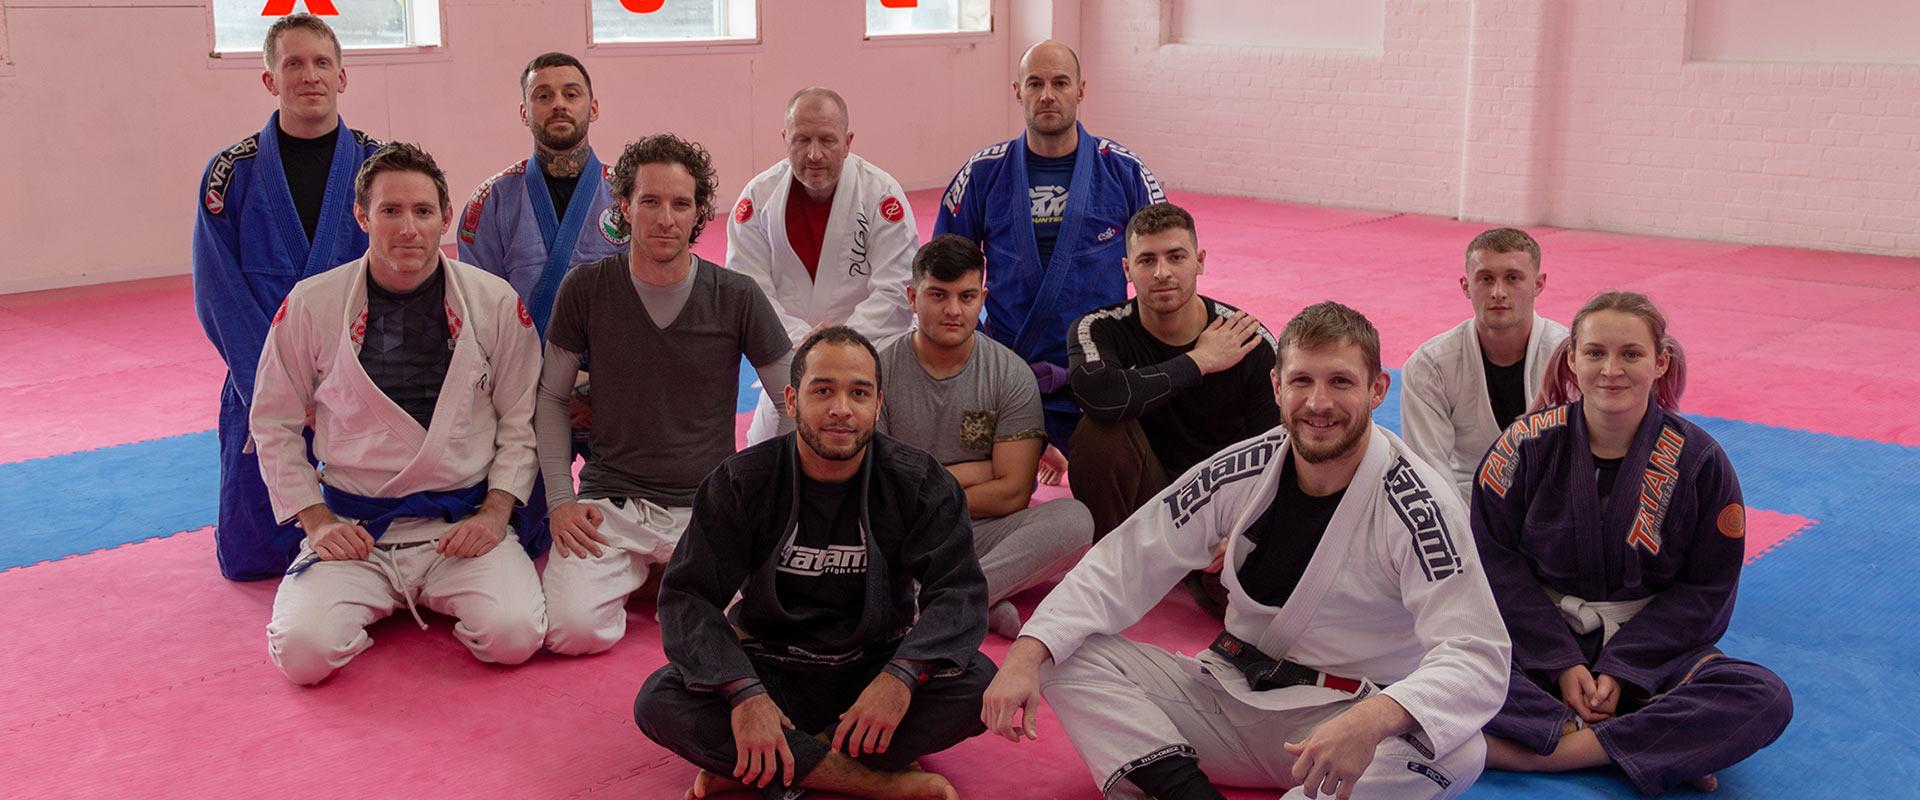 Jui Jitsu Cardiff Chris Rees Academy Ufc Ultimate